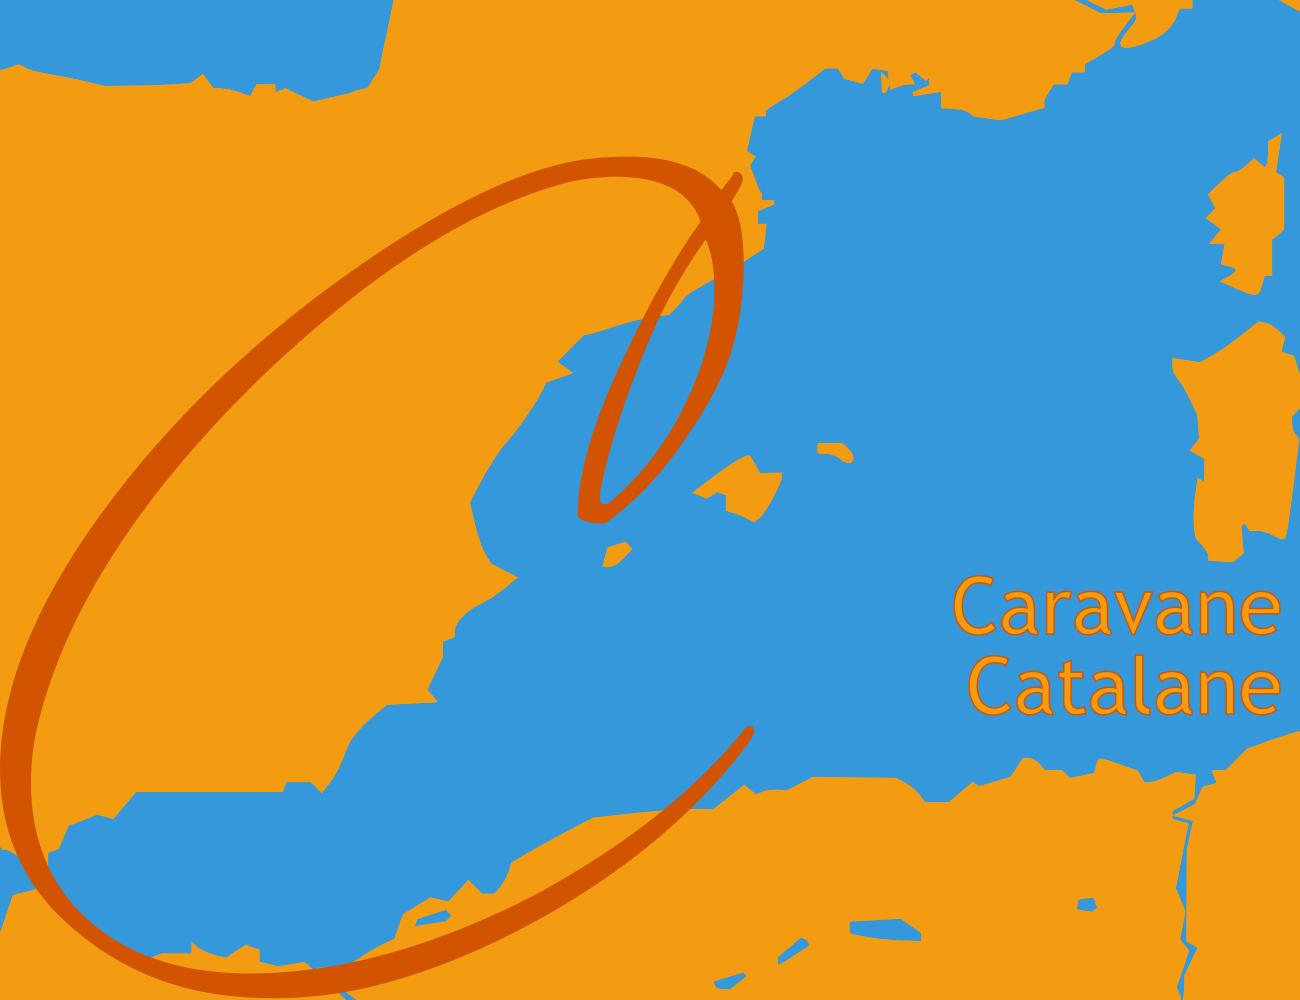 logo caravane catalane